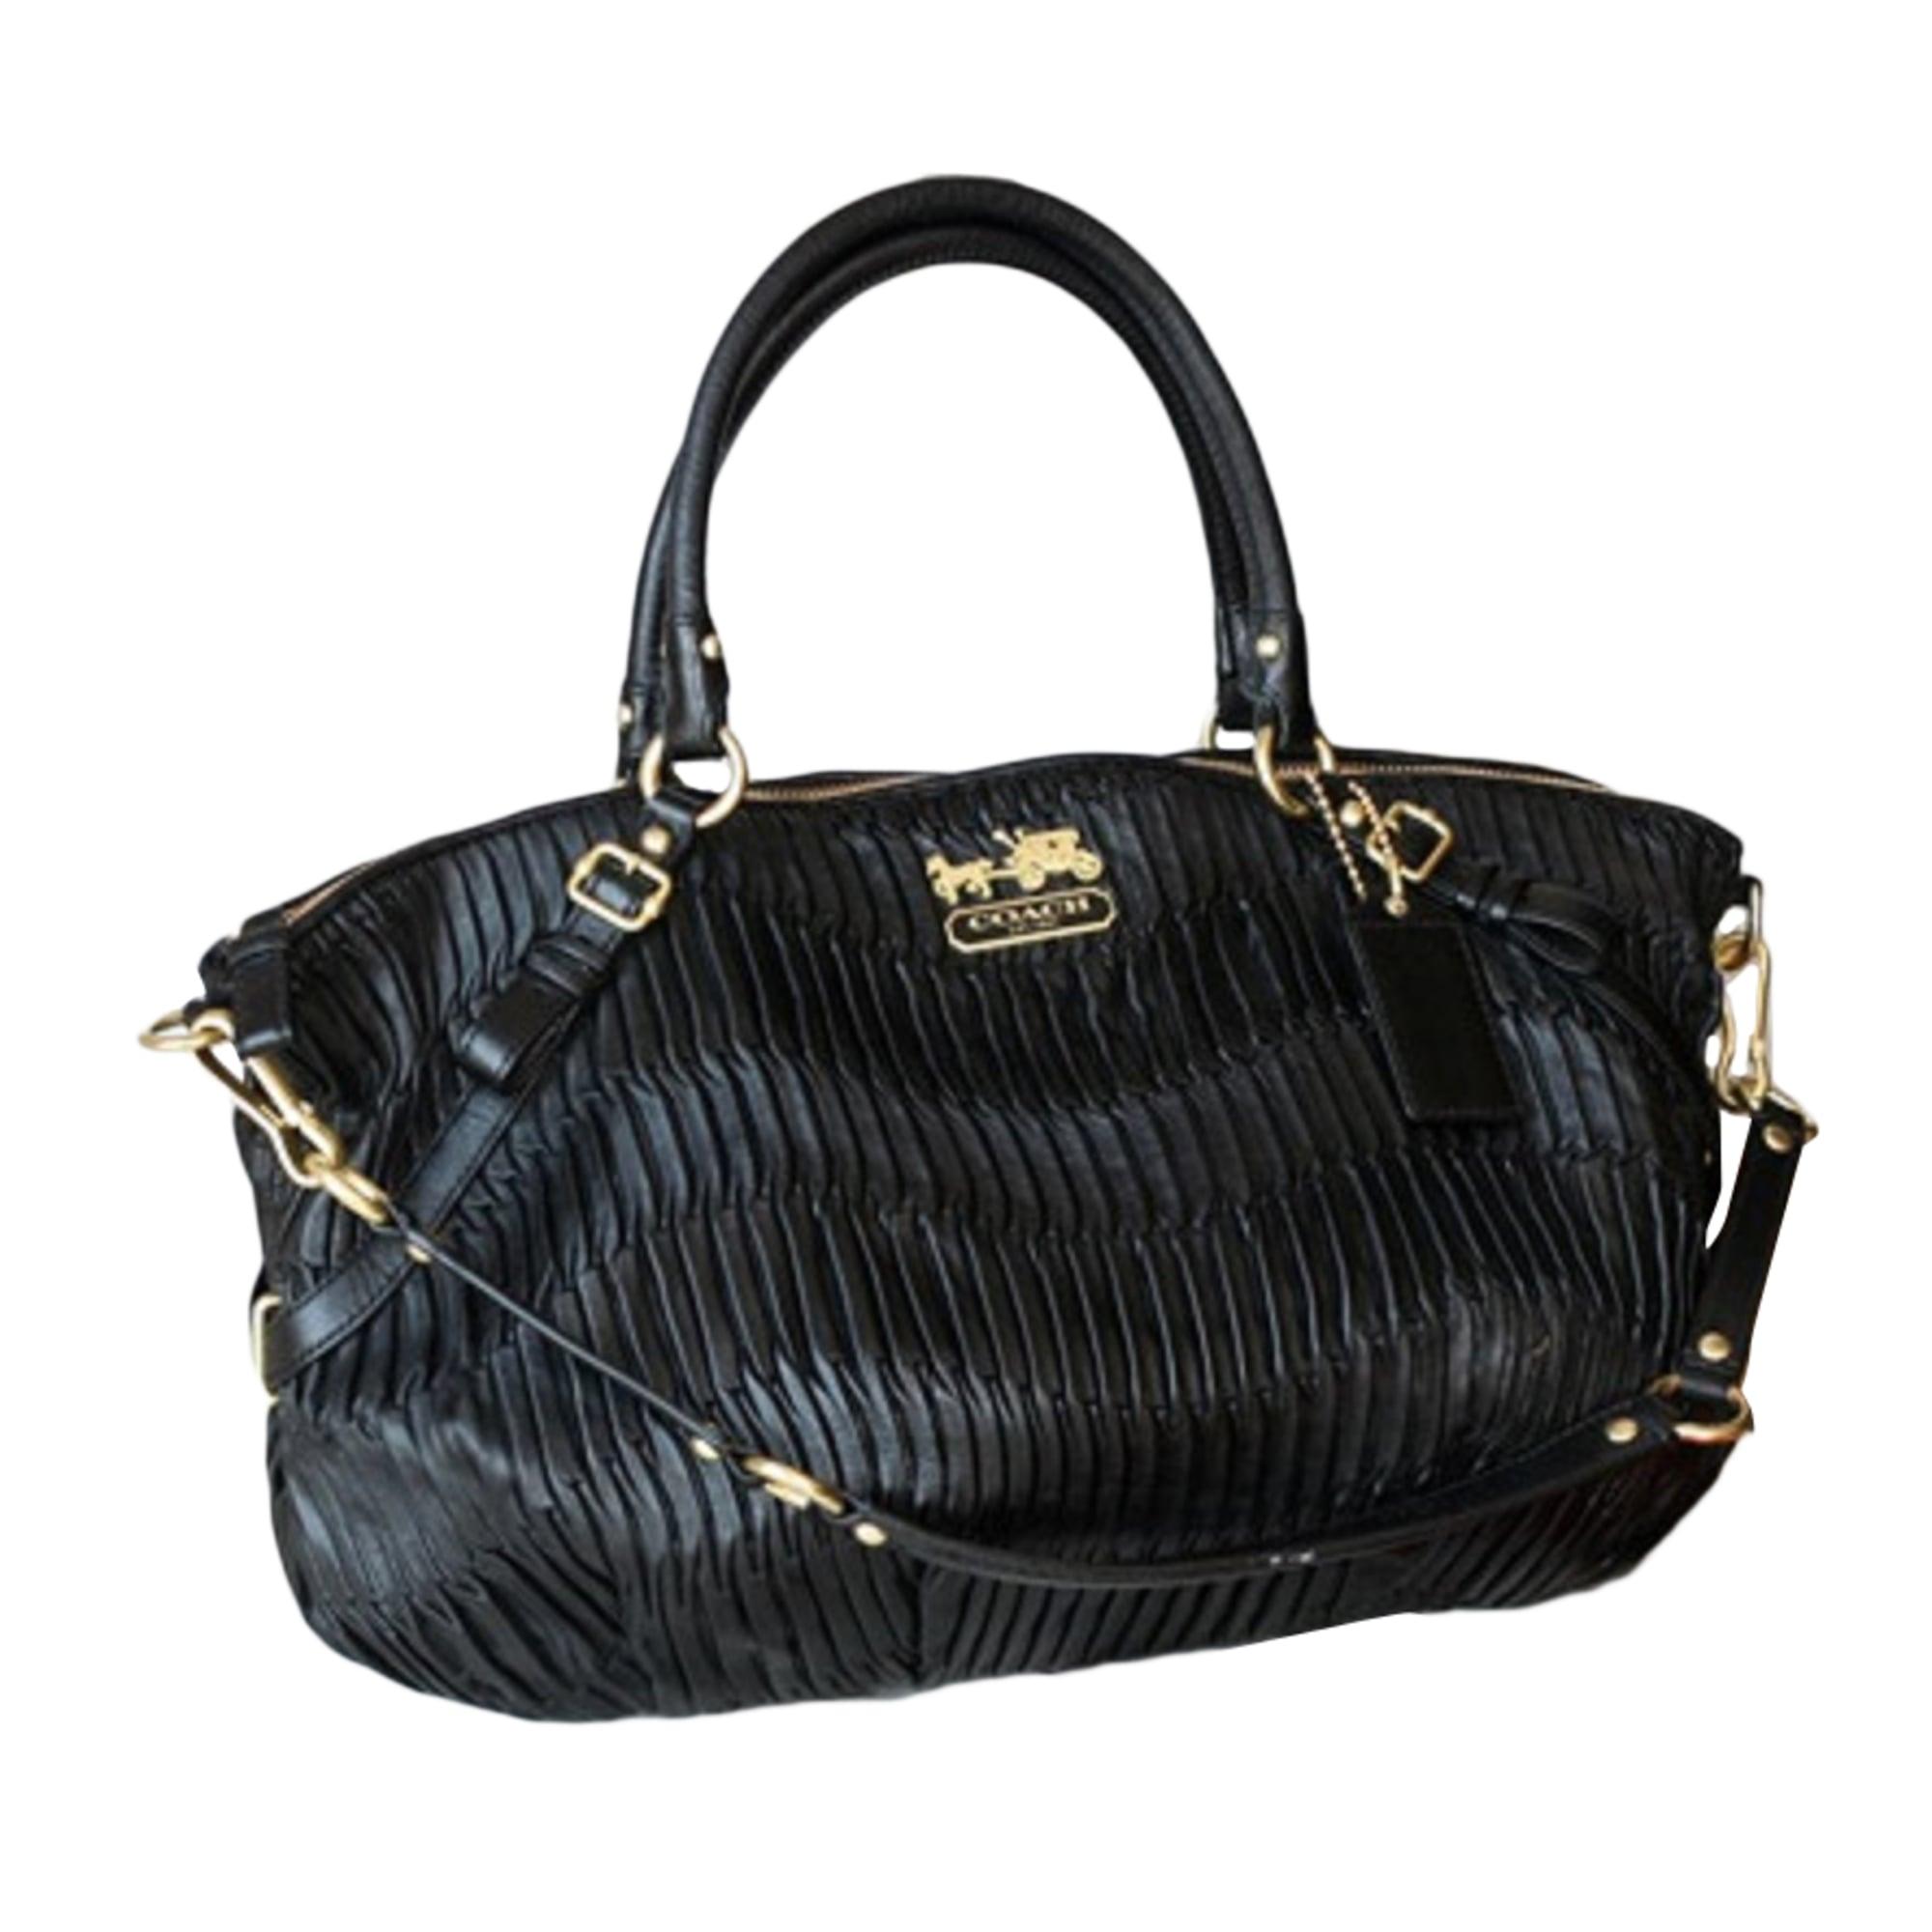 sac main en cuir coach noir vendu par dianafromcanada. Black Bedroom Furniture Sets. Home Design Ideas